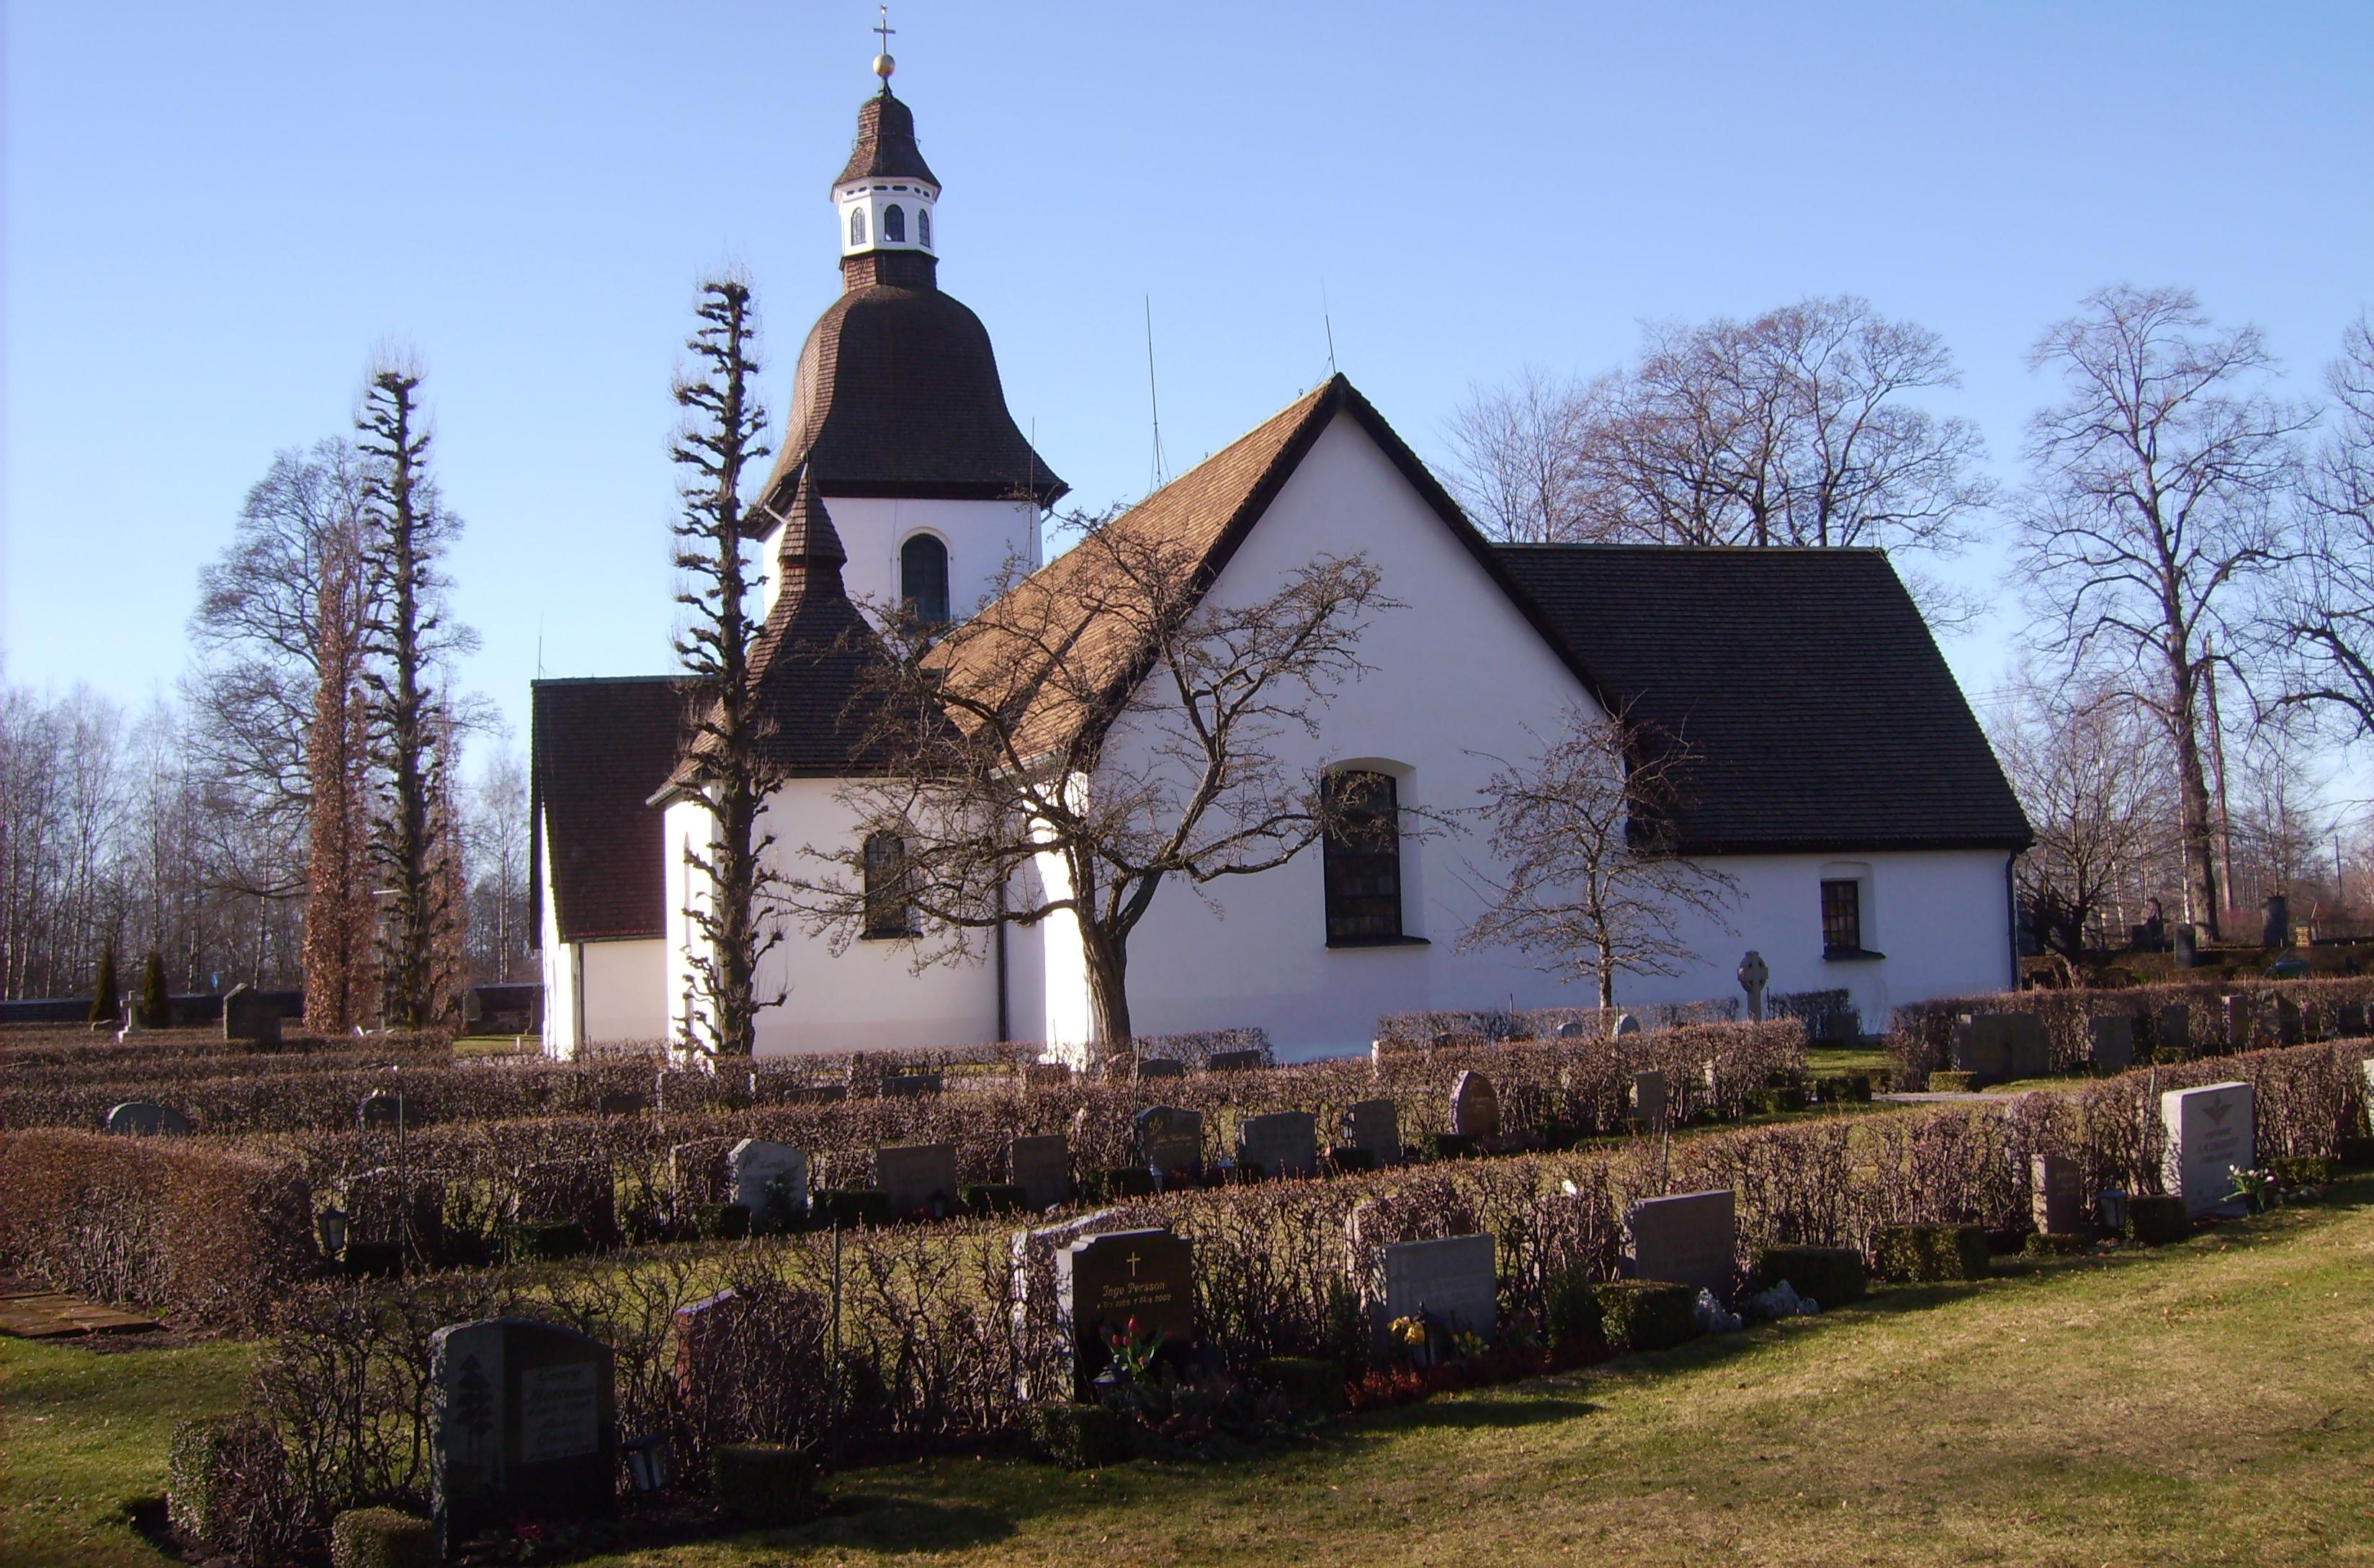 Norrkping stra Eneby Parish, stergtland, Sweden